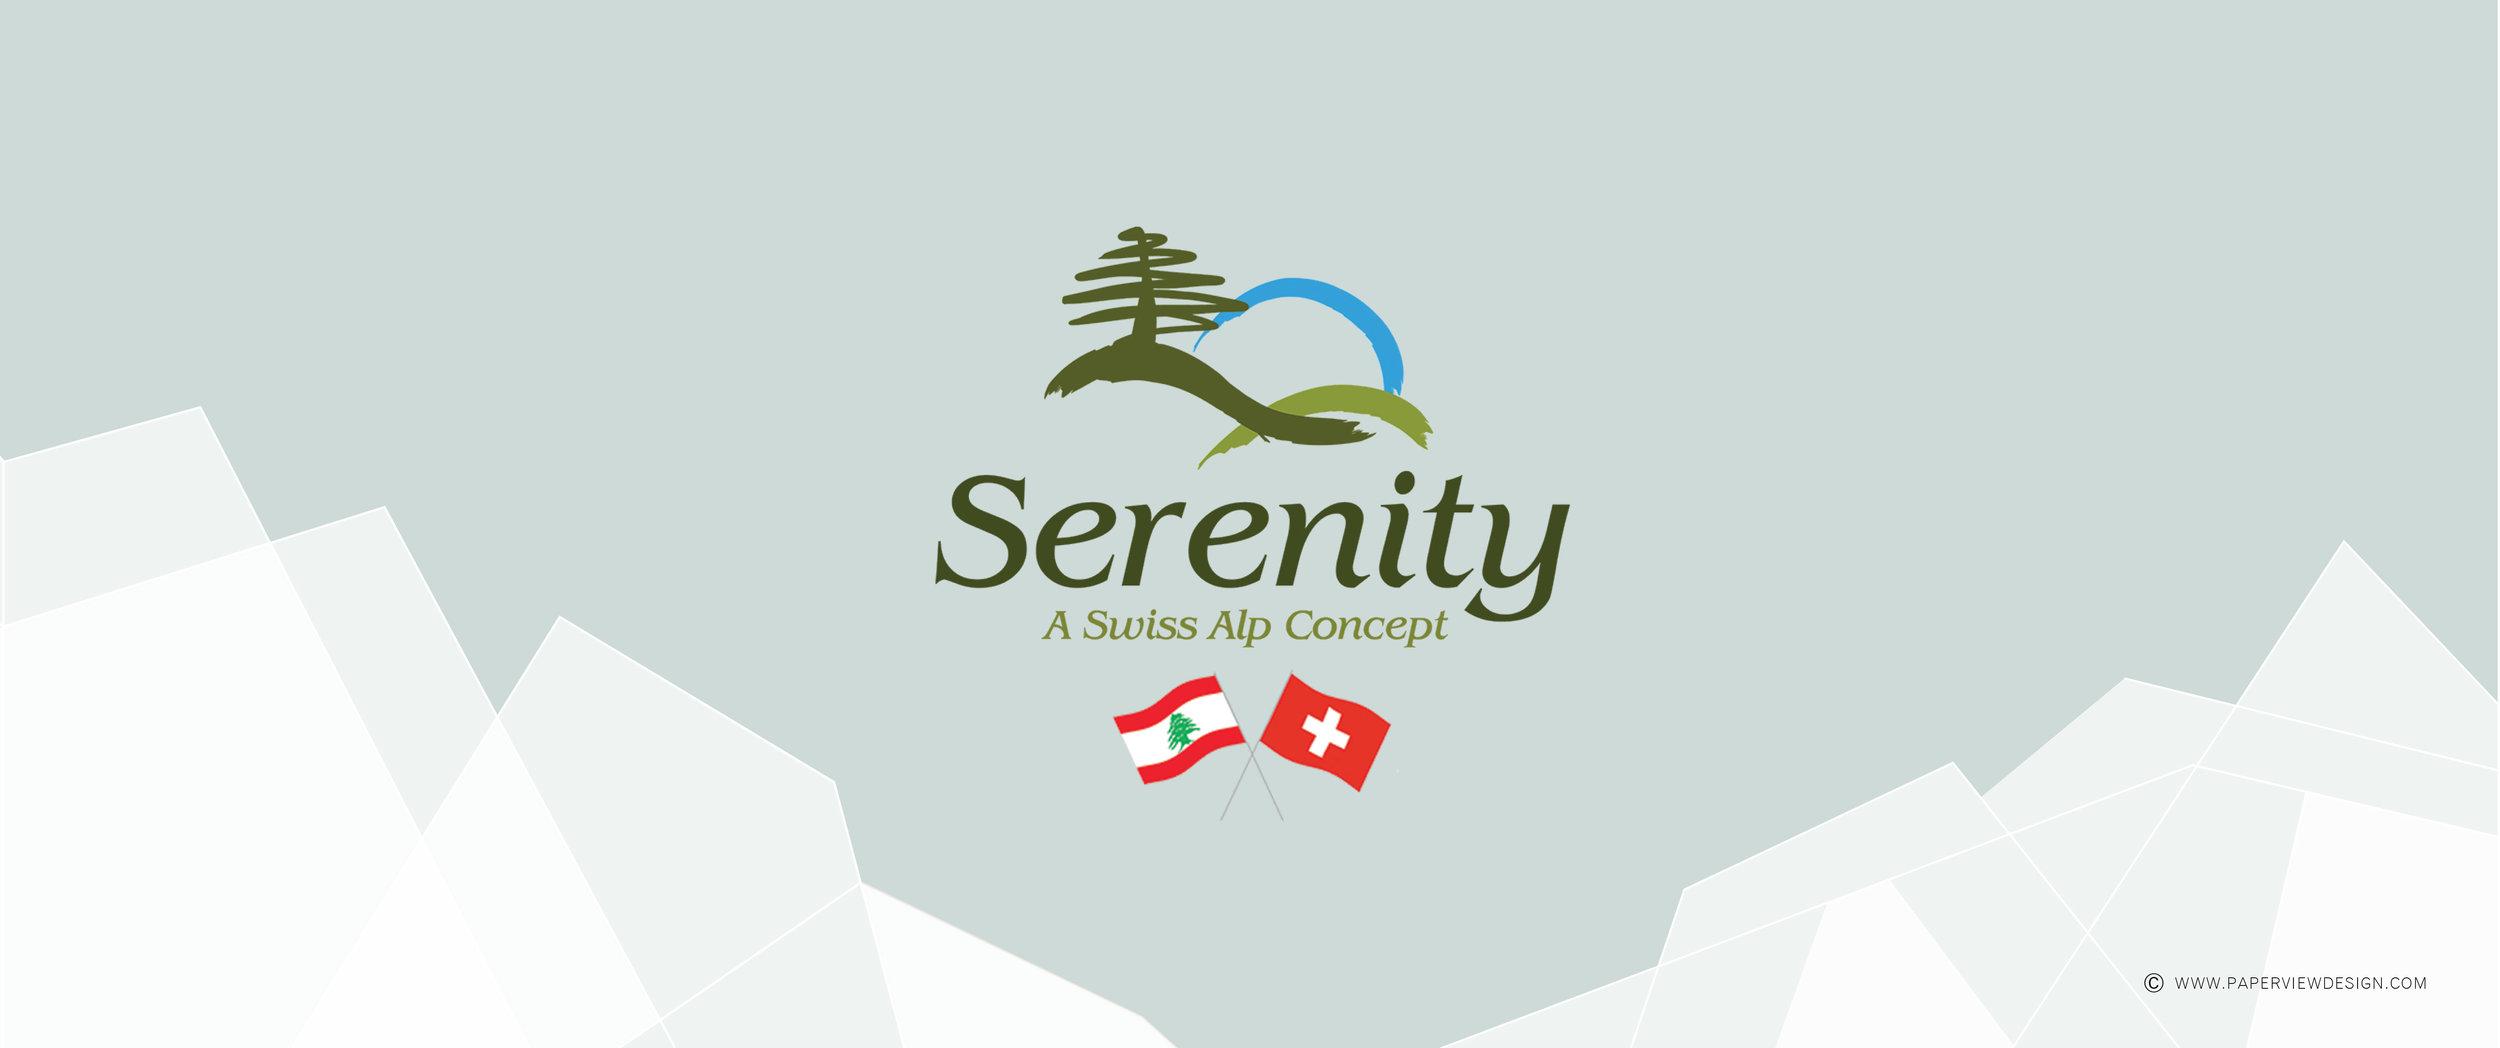 Serenity.jpg